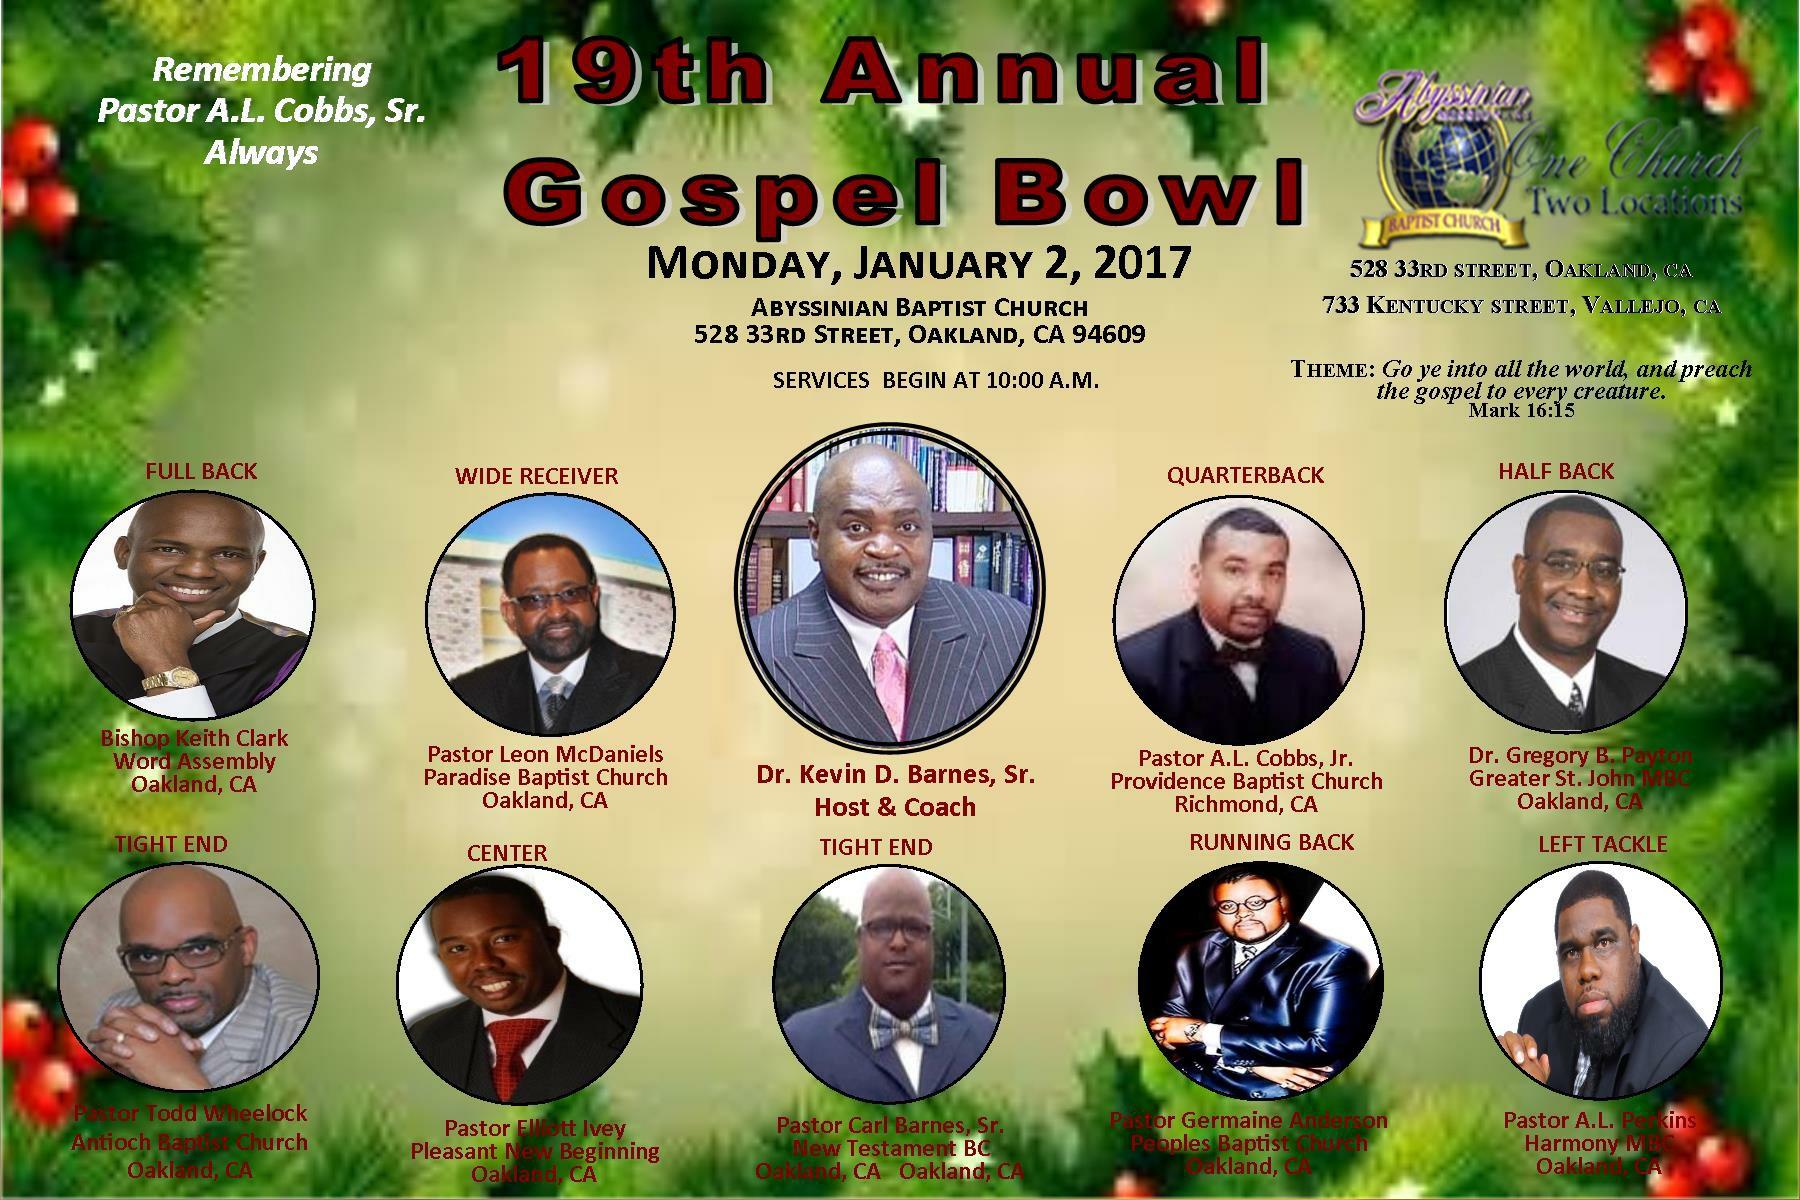 Gospel Bowl 2017